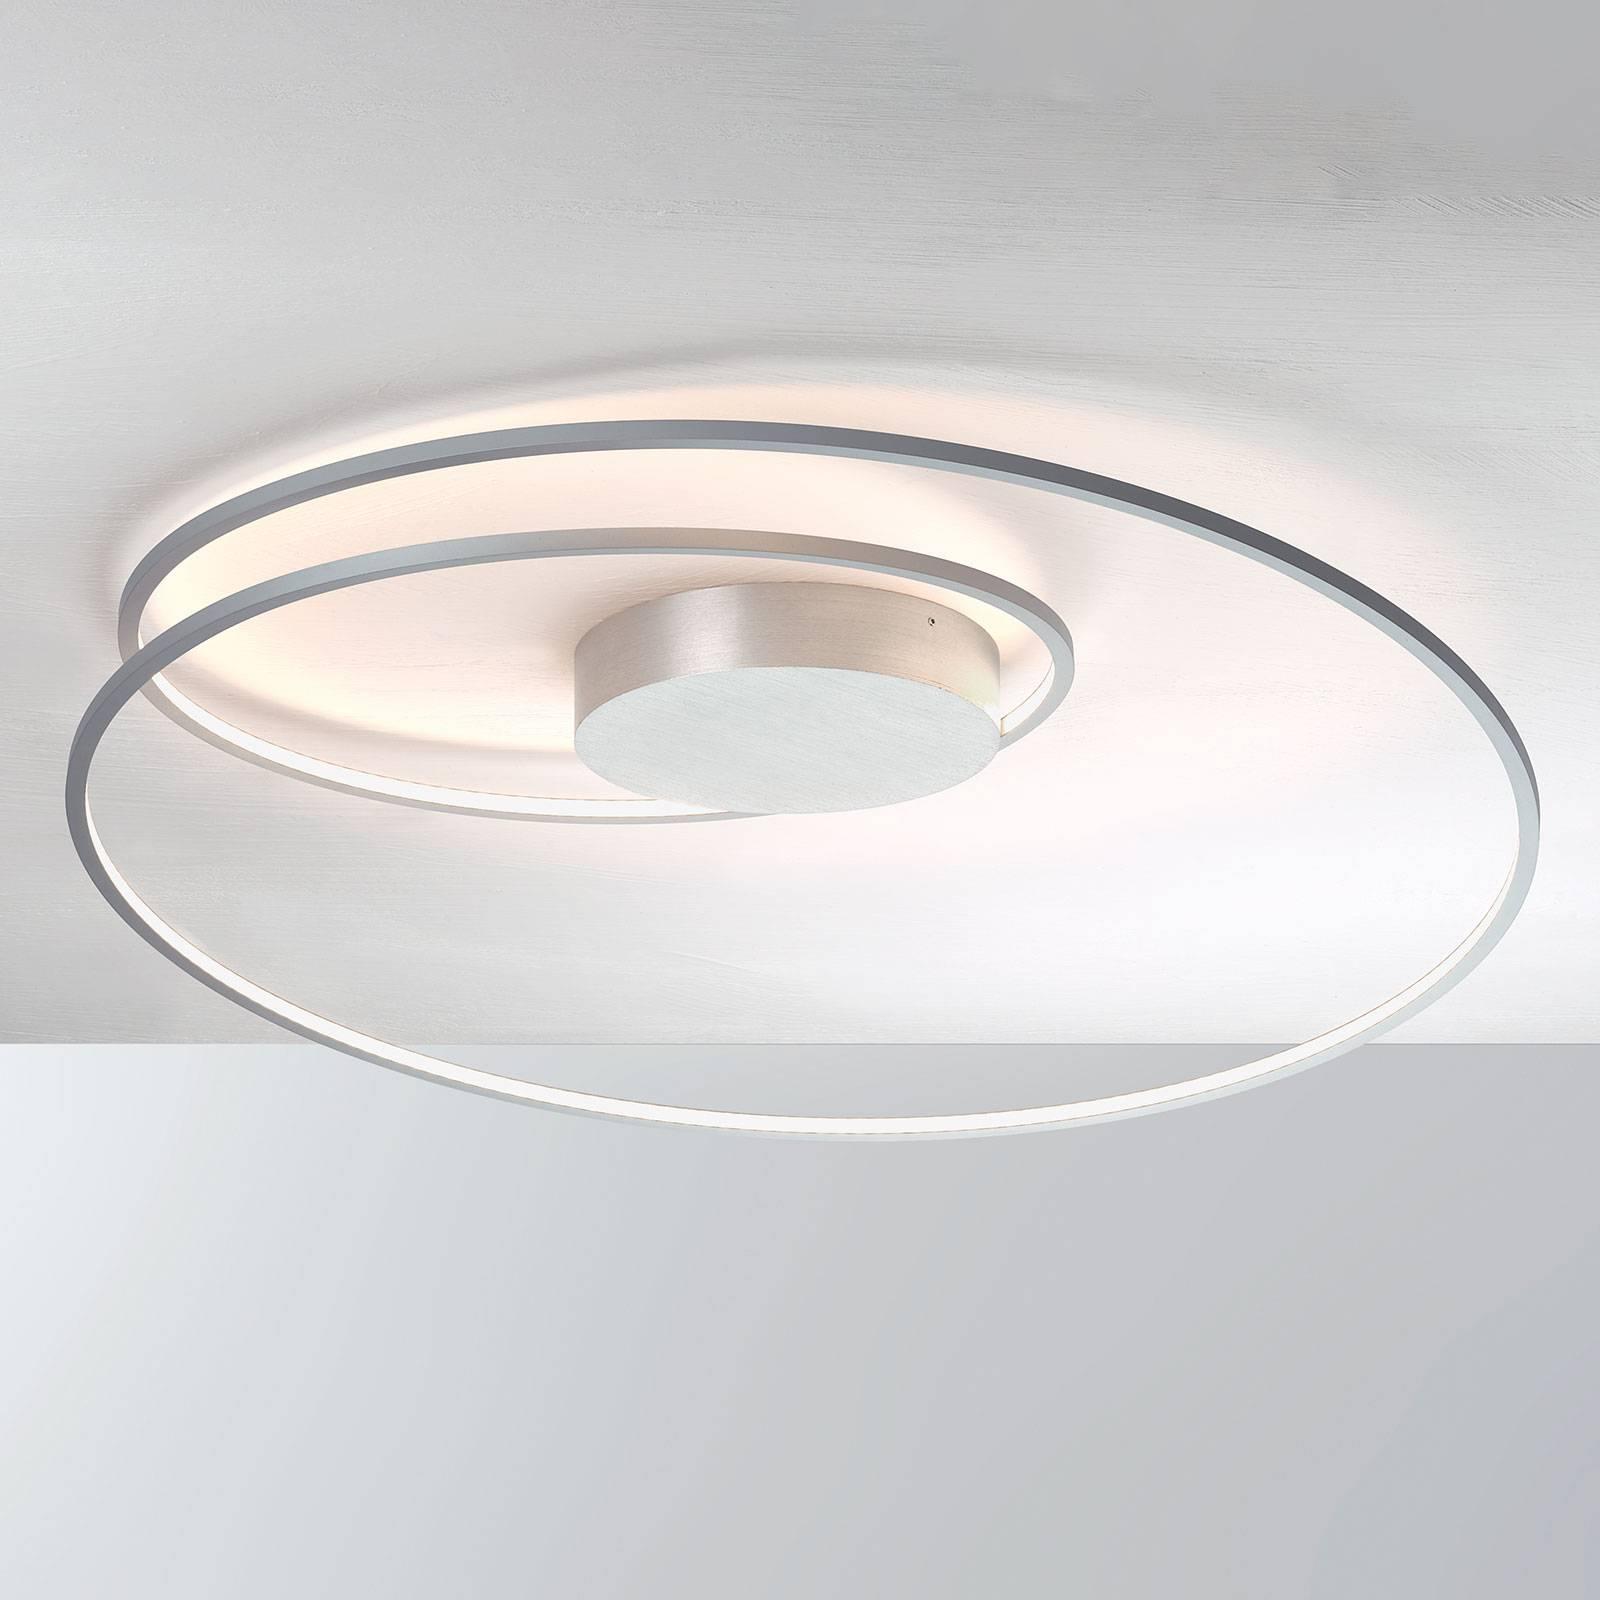 At – tehokas LED-kattovalaisin